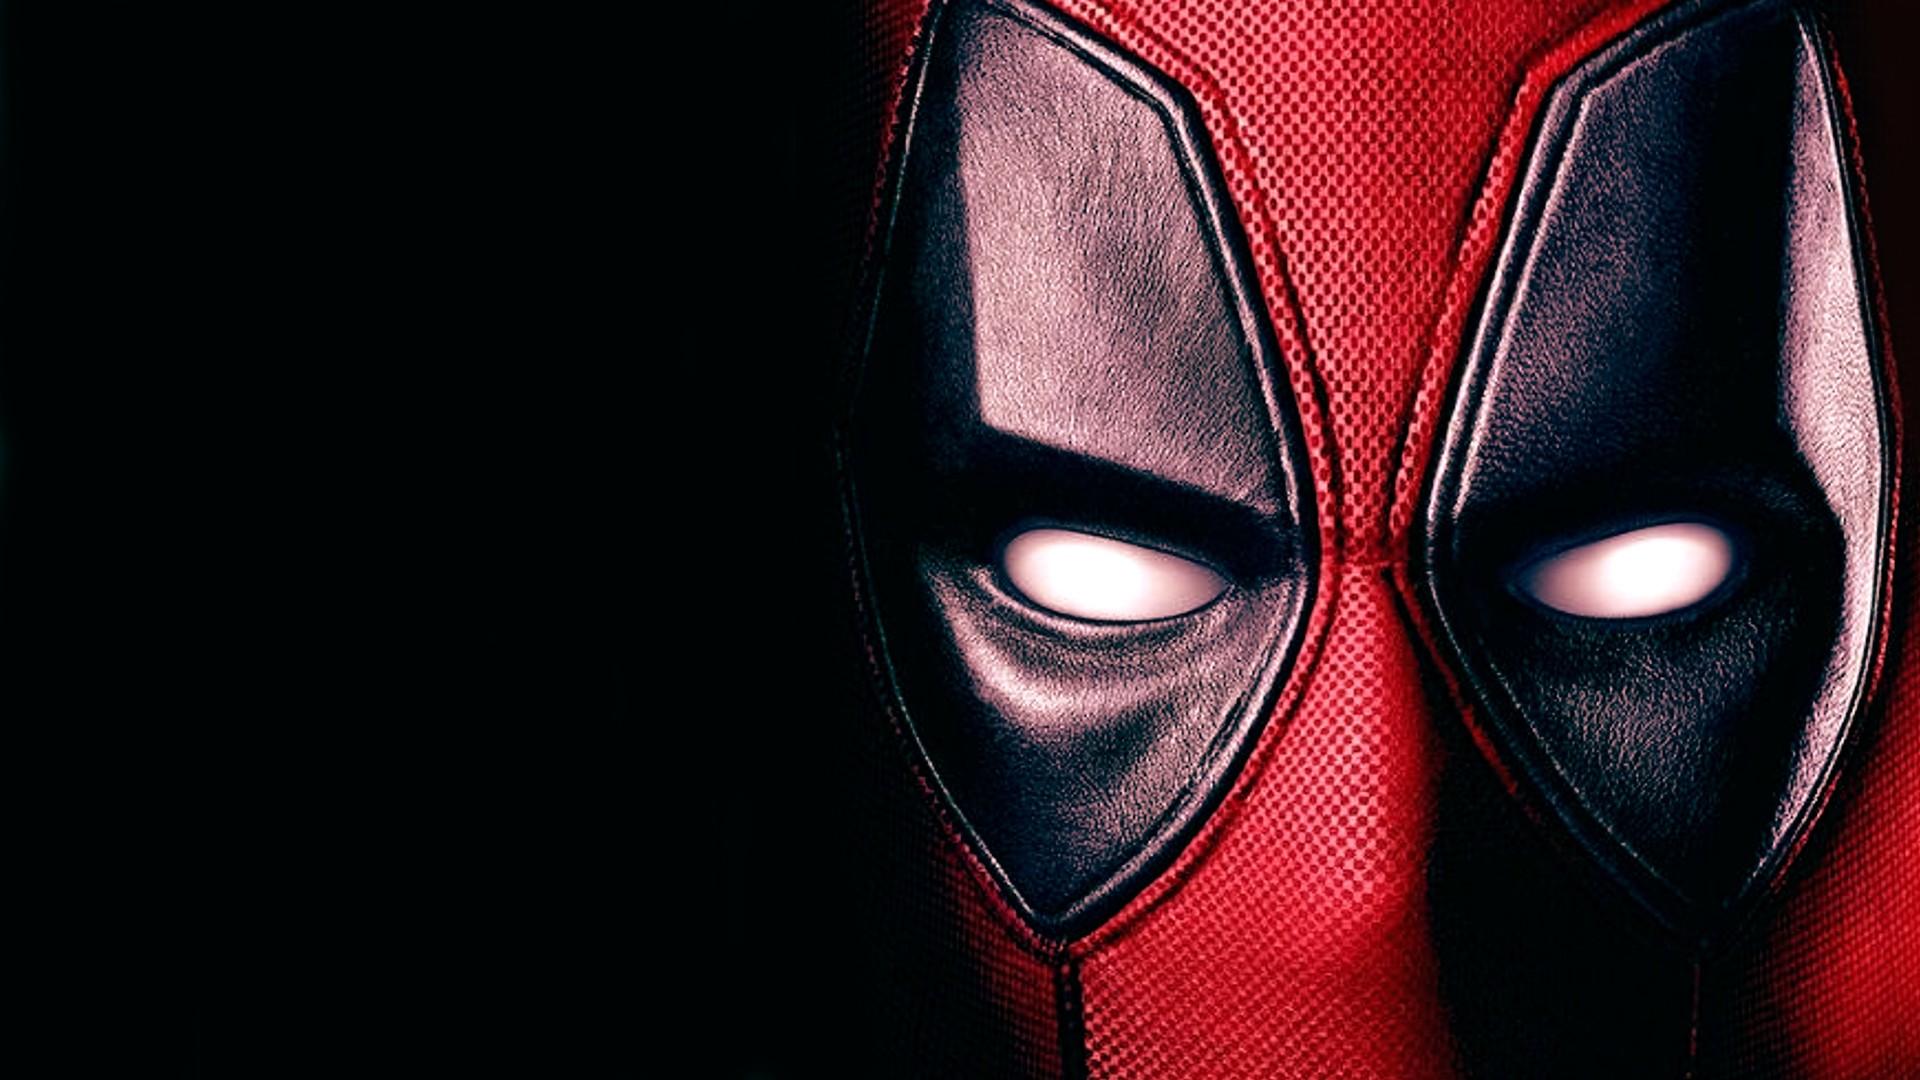 Deadpool Wallpaper Android Hd: Deadpool Wallpaper HD 1080p ·① Download Free Stunning HD